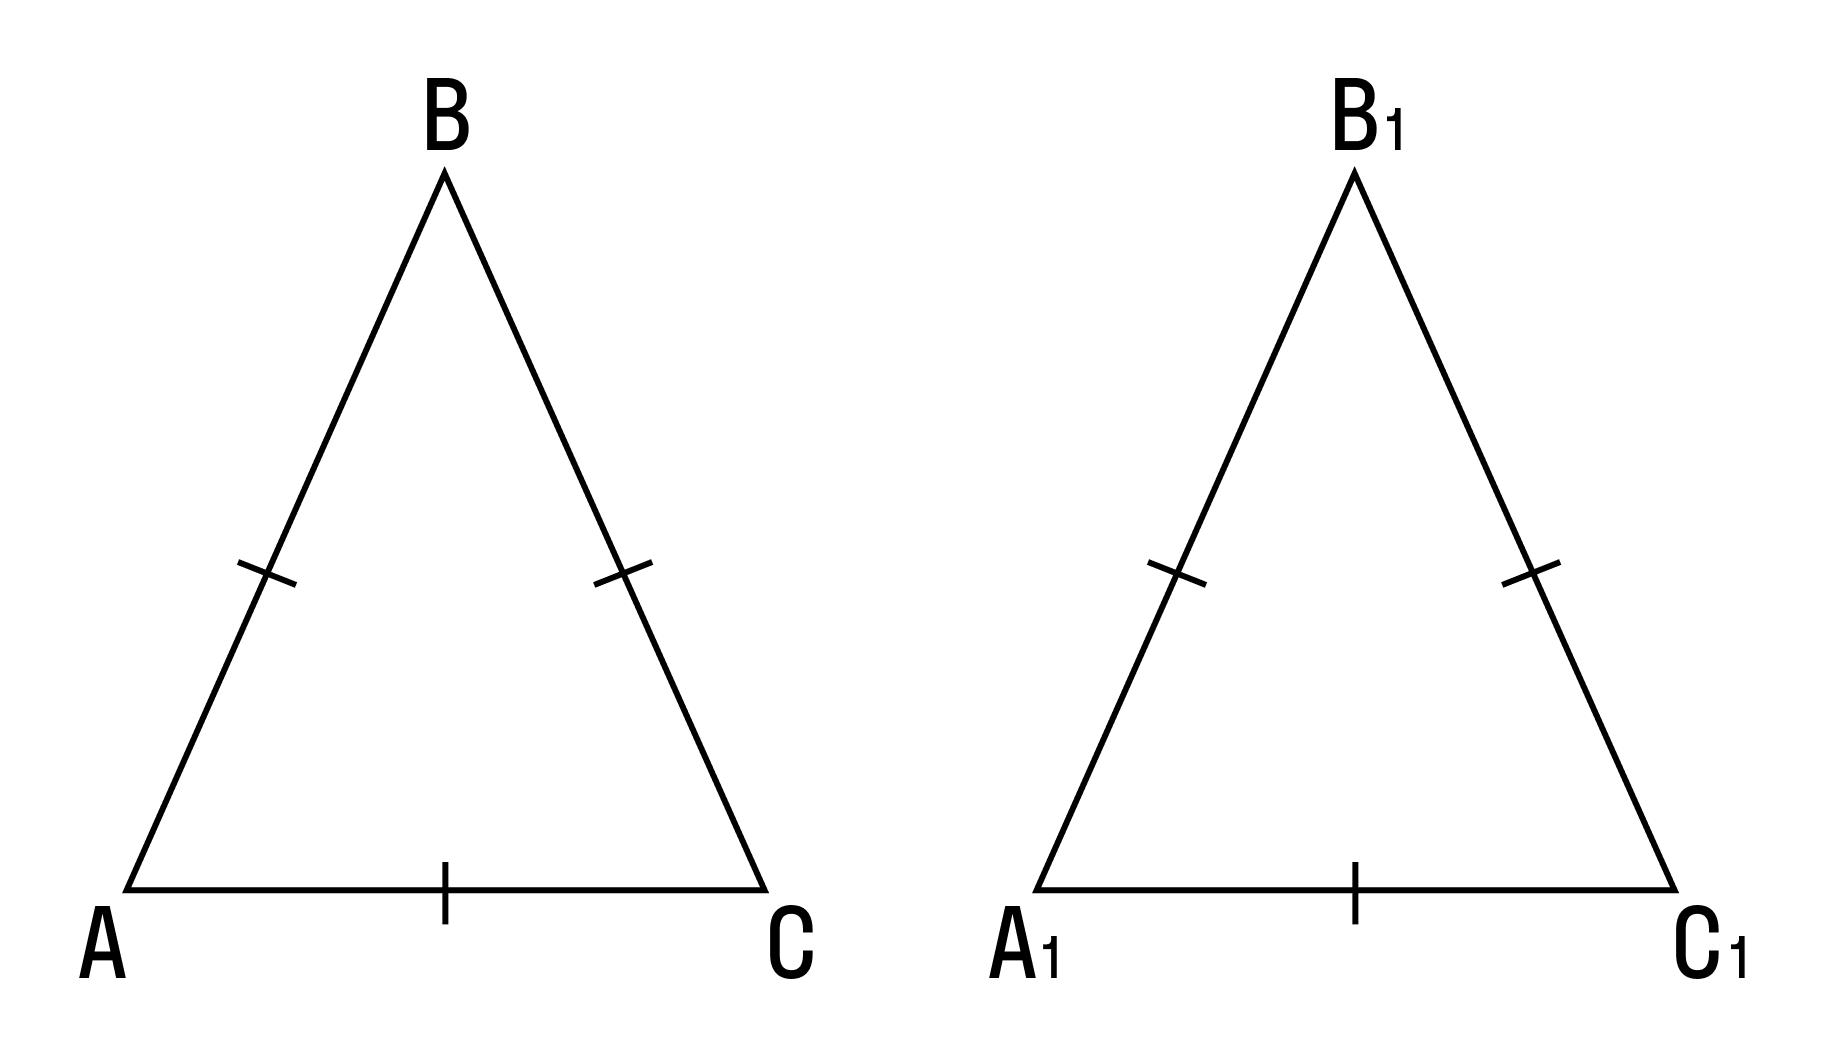 Третий признак равенства равнобедренного треугольника